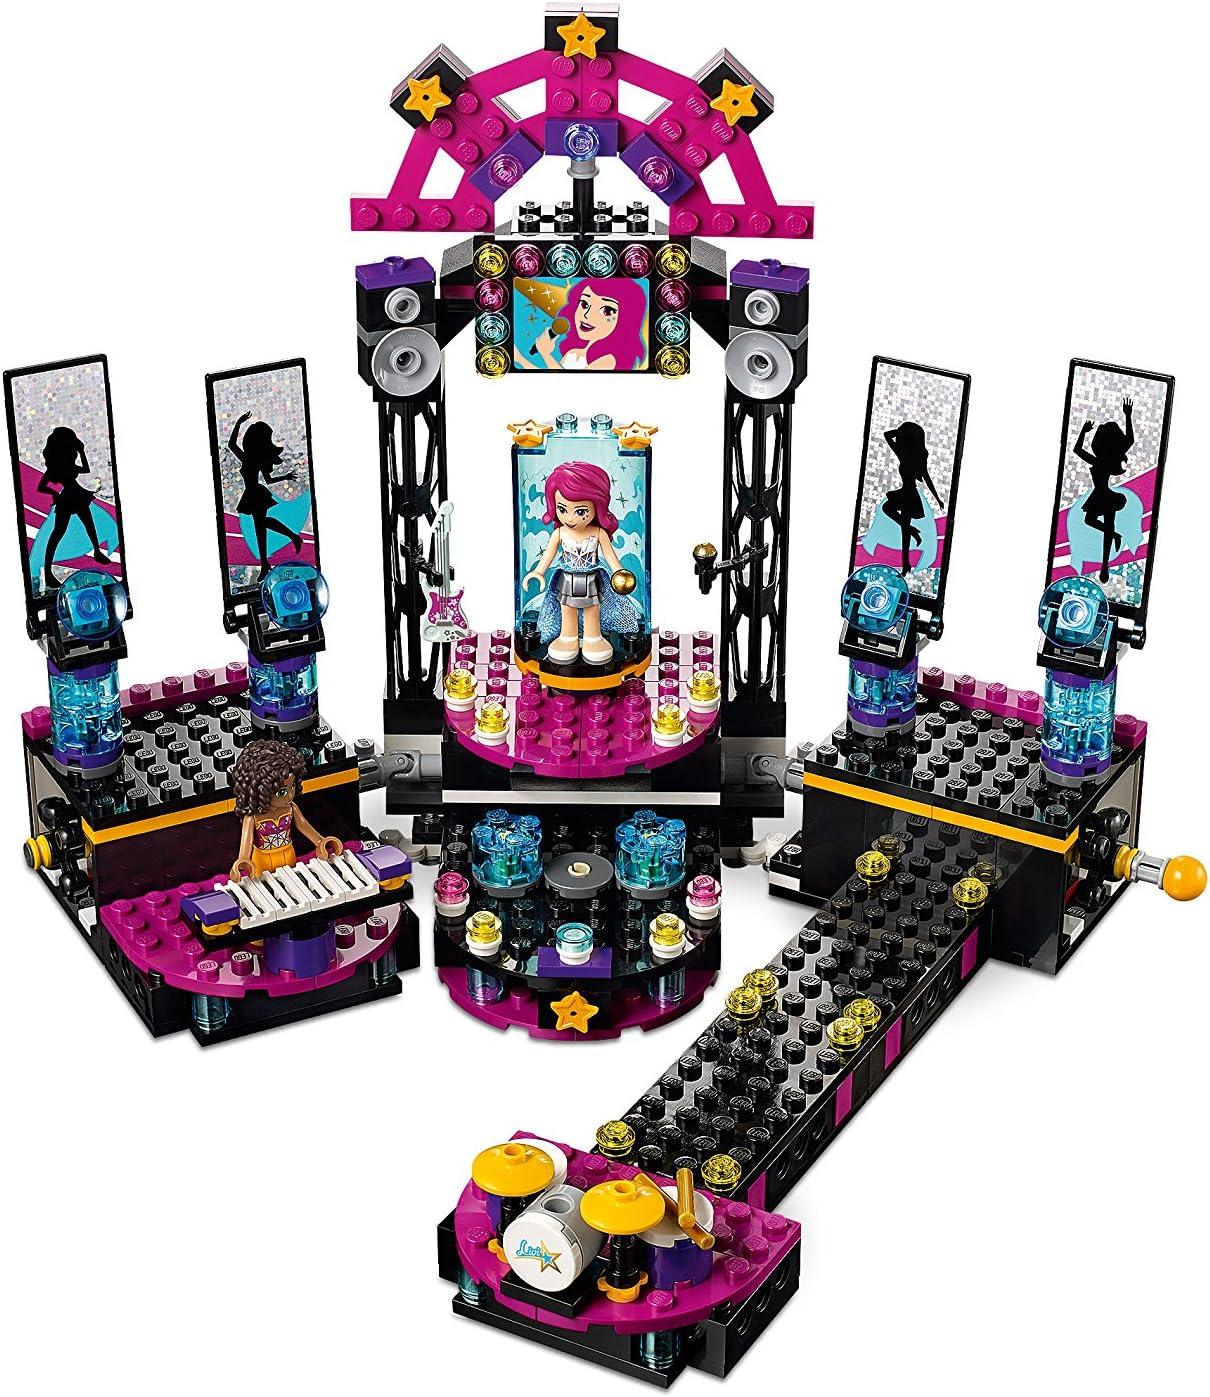 Lego ® Friends personaje estrella pop asterisco cantante música Girl polybag nuevo embalaje original 30205